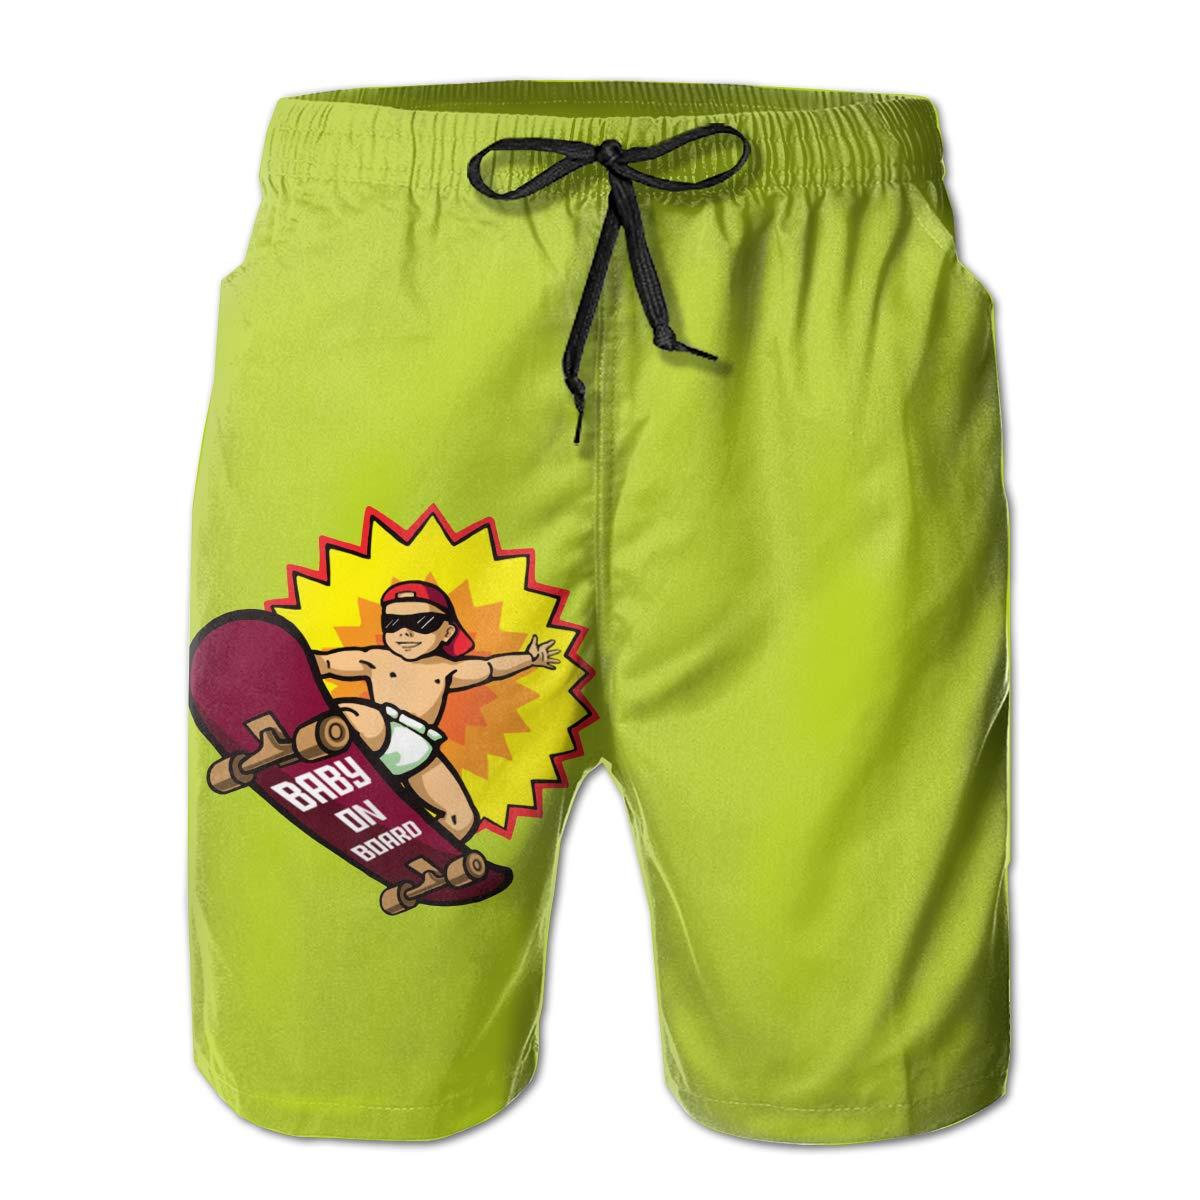 Baby On Board Beach Board Shorts Mens Beach Shorts Swim Trunks Swimsuit Athletic Shorts